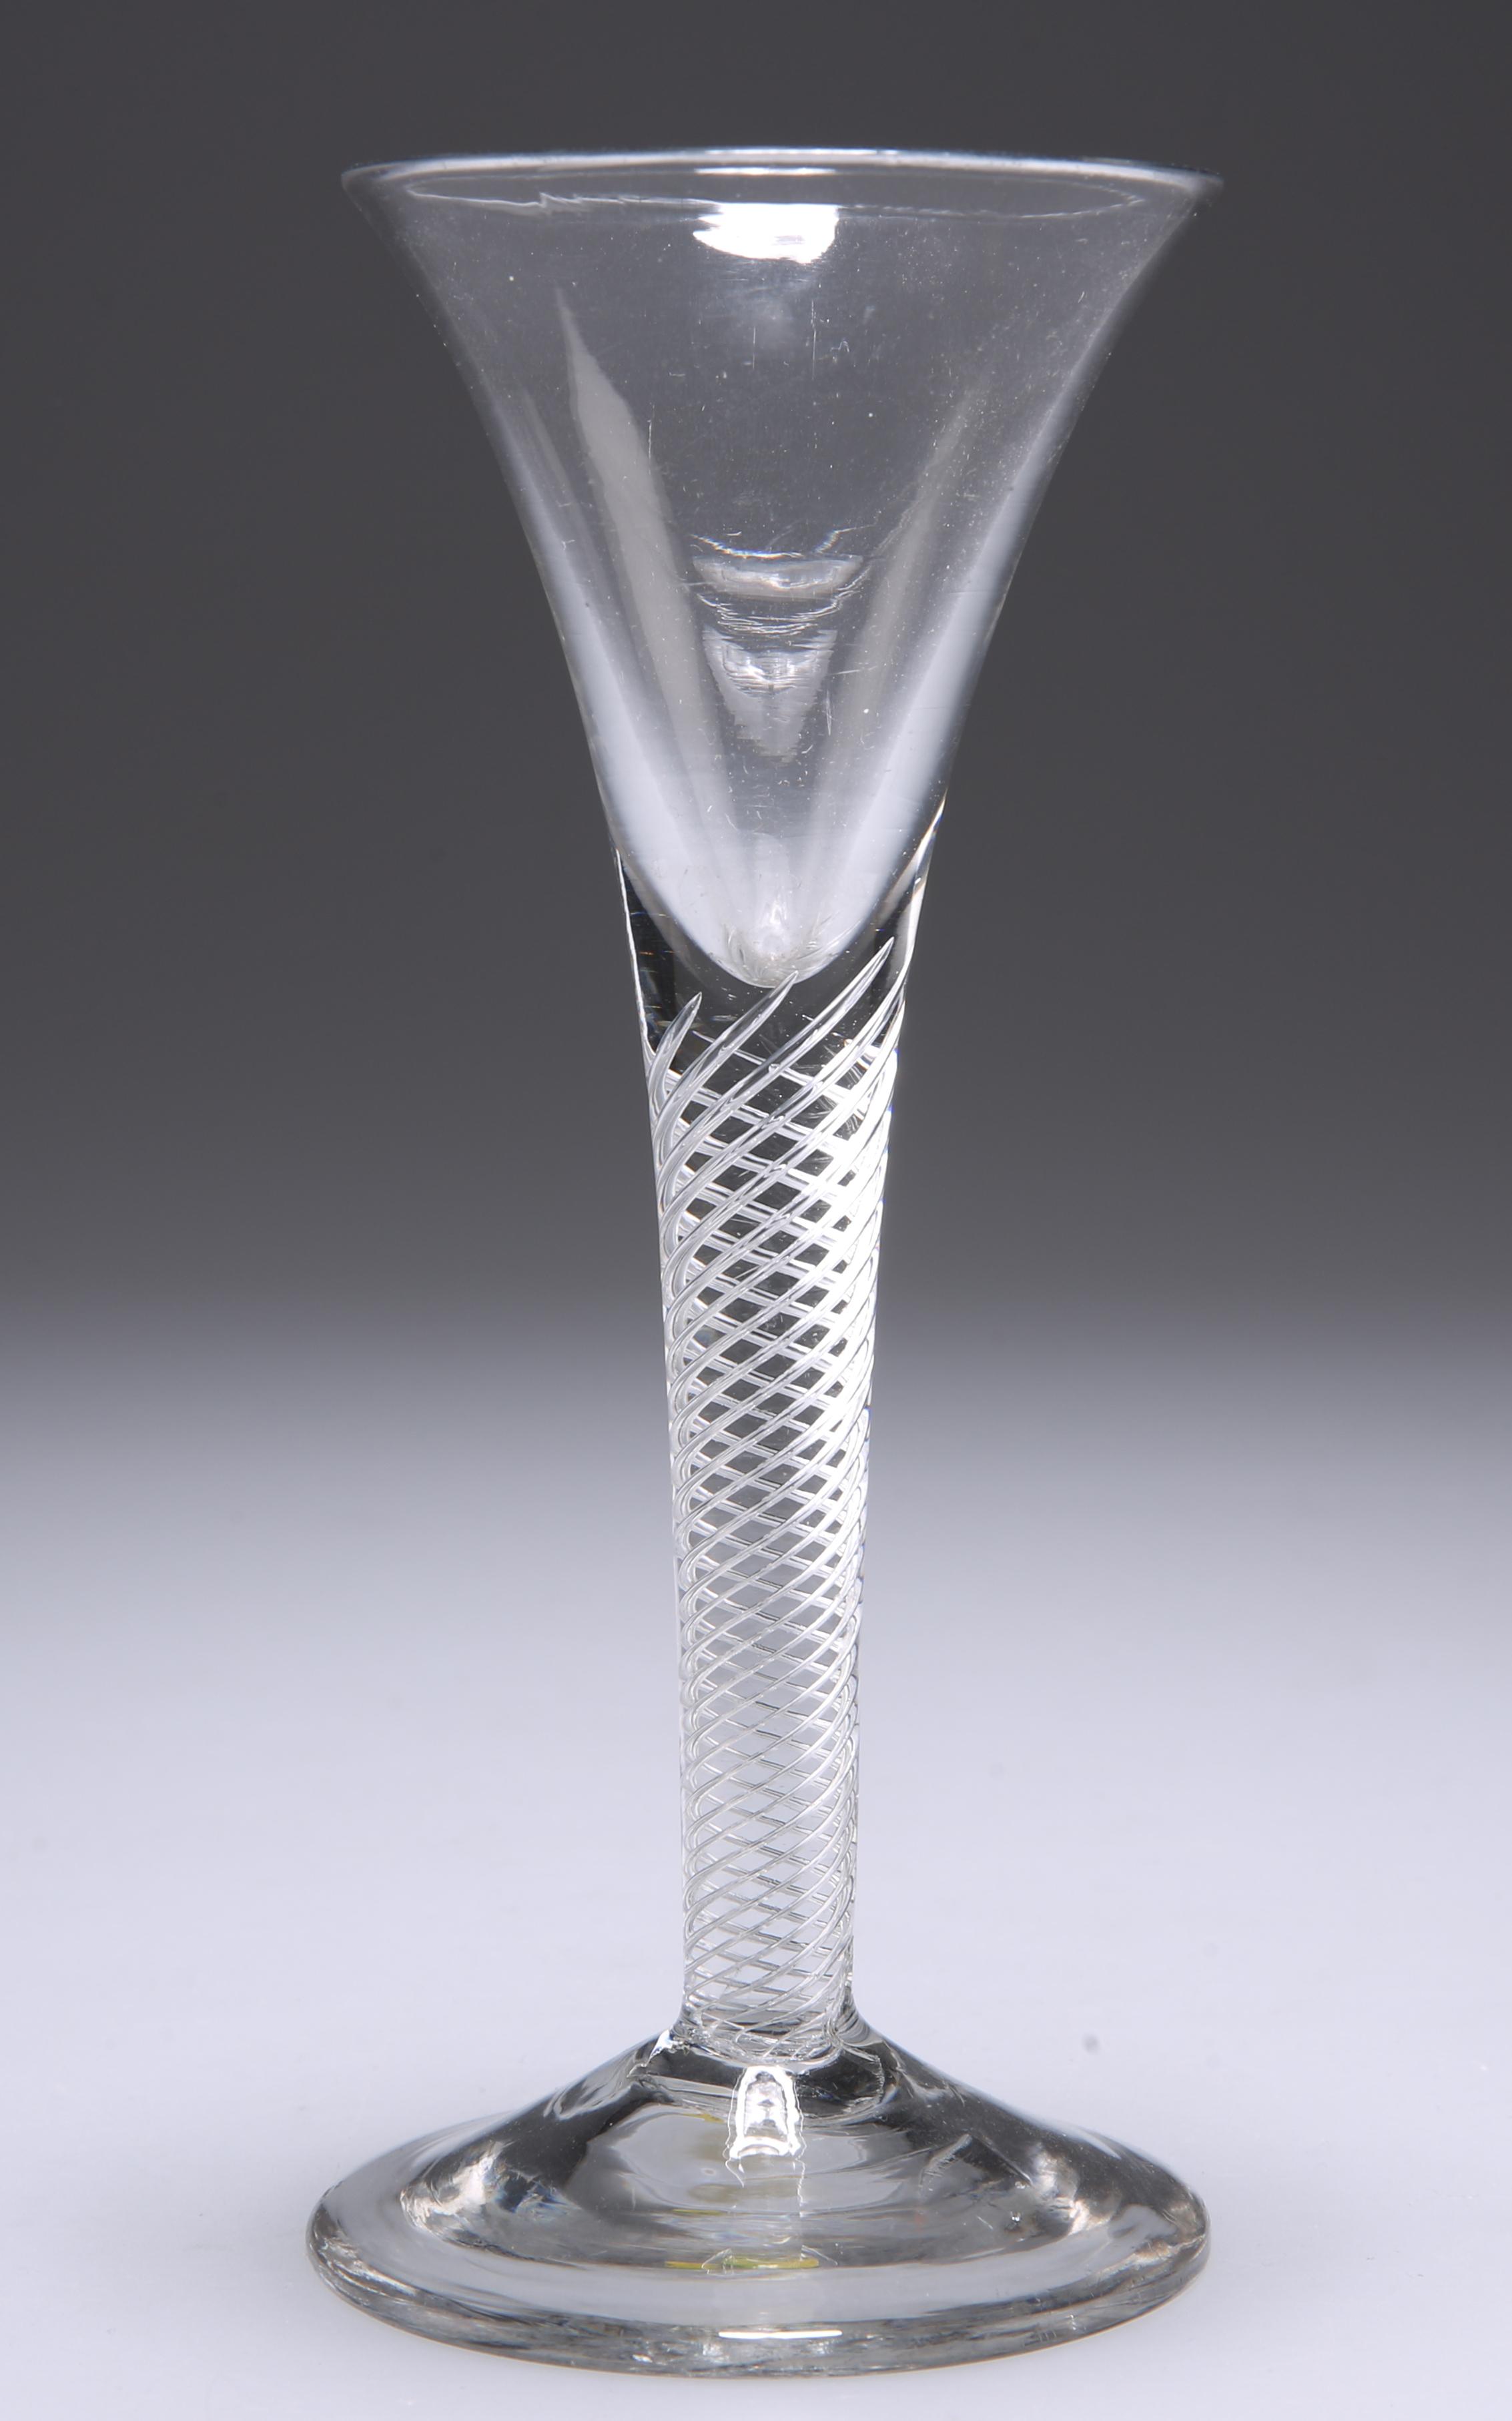 AN AIR TWIST WINE GLASS, CIRCA 1770 - Image 2 of 2